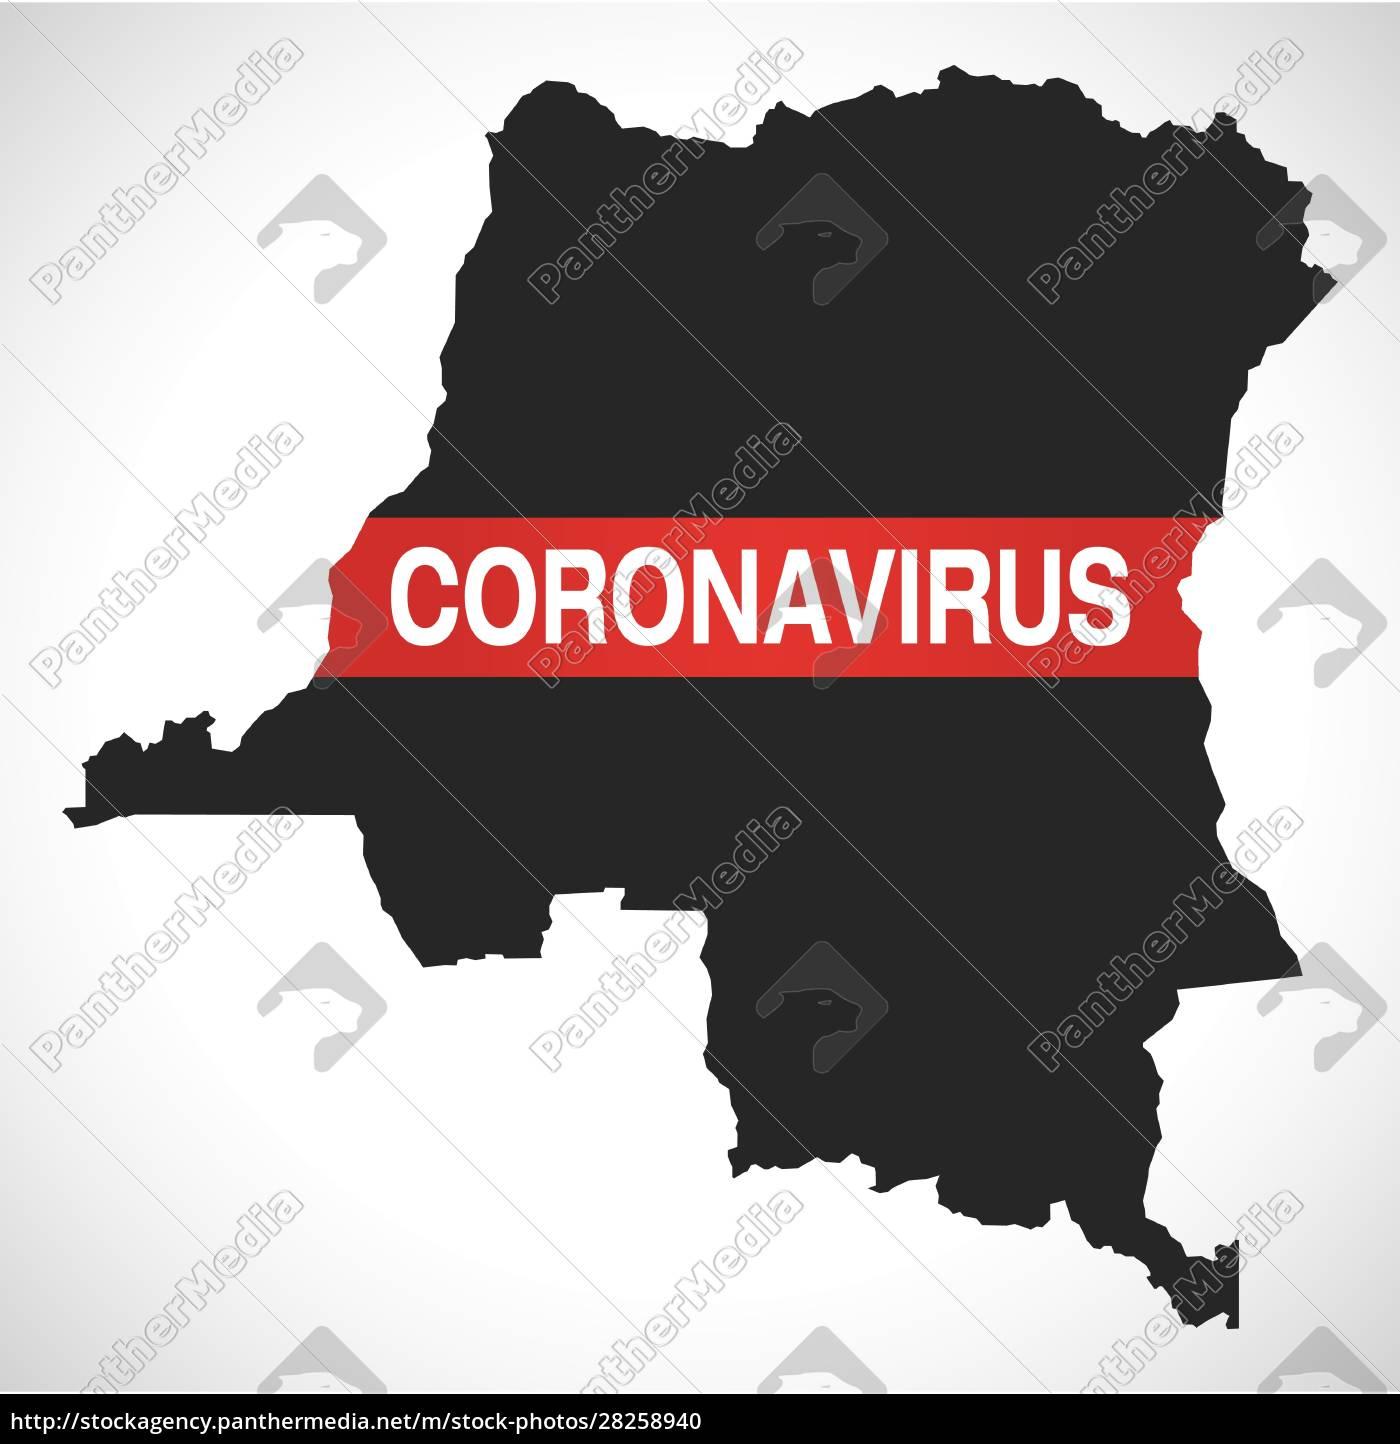 congo, democratic, republic, map, with, coronavirus - 28258940